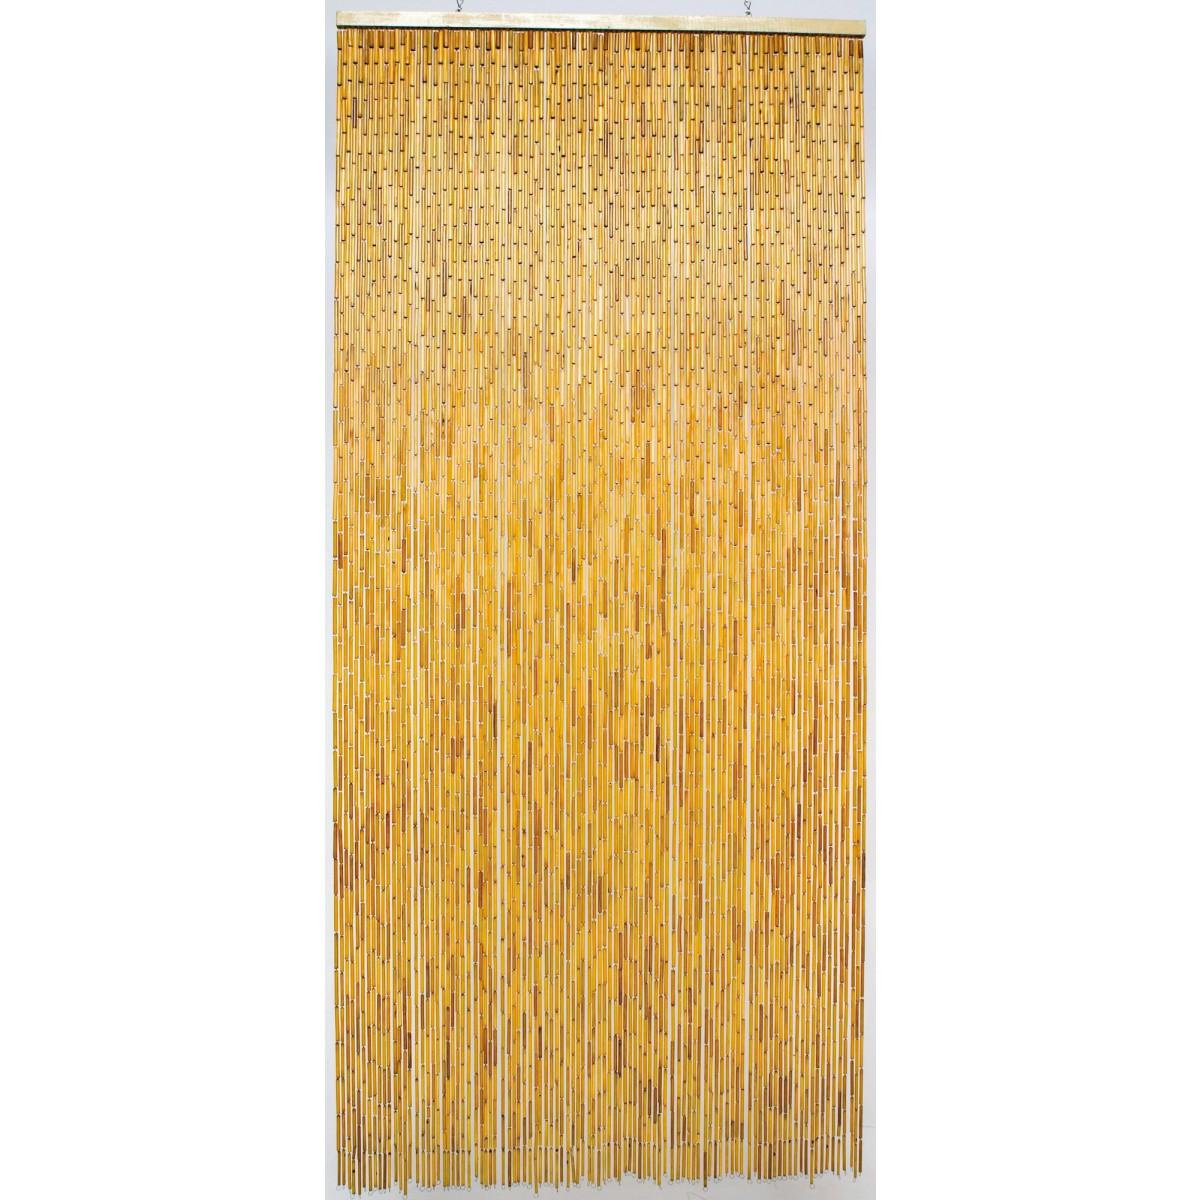 rideau de porte bambou naturel morel 100 x 220 cm de rideau de porte. Black Bedroom Furniture Sets. Home Design Ideas